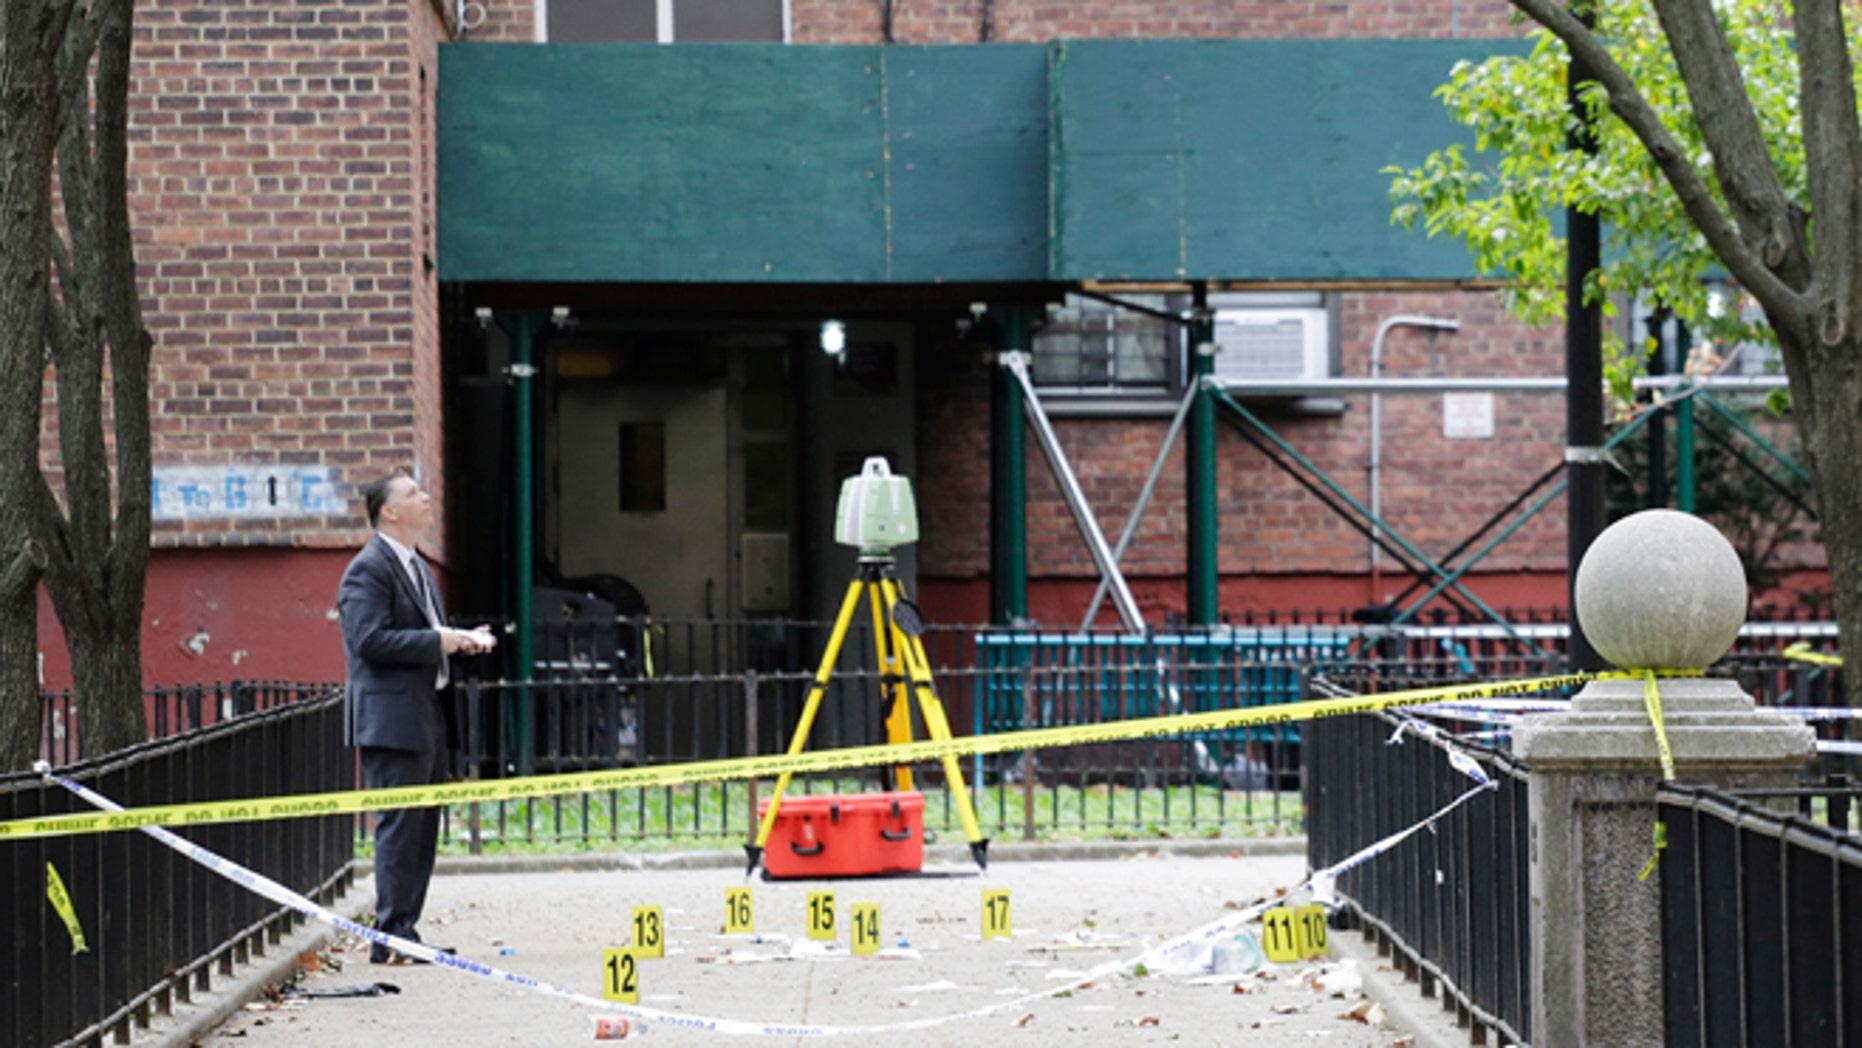 A New York City crime scene investigator inspects the scene of a triple homicide in Brooklyn.